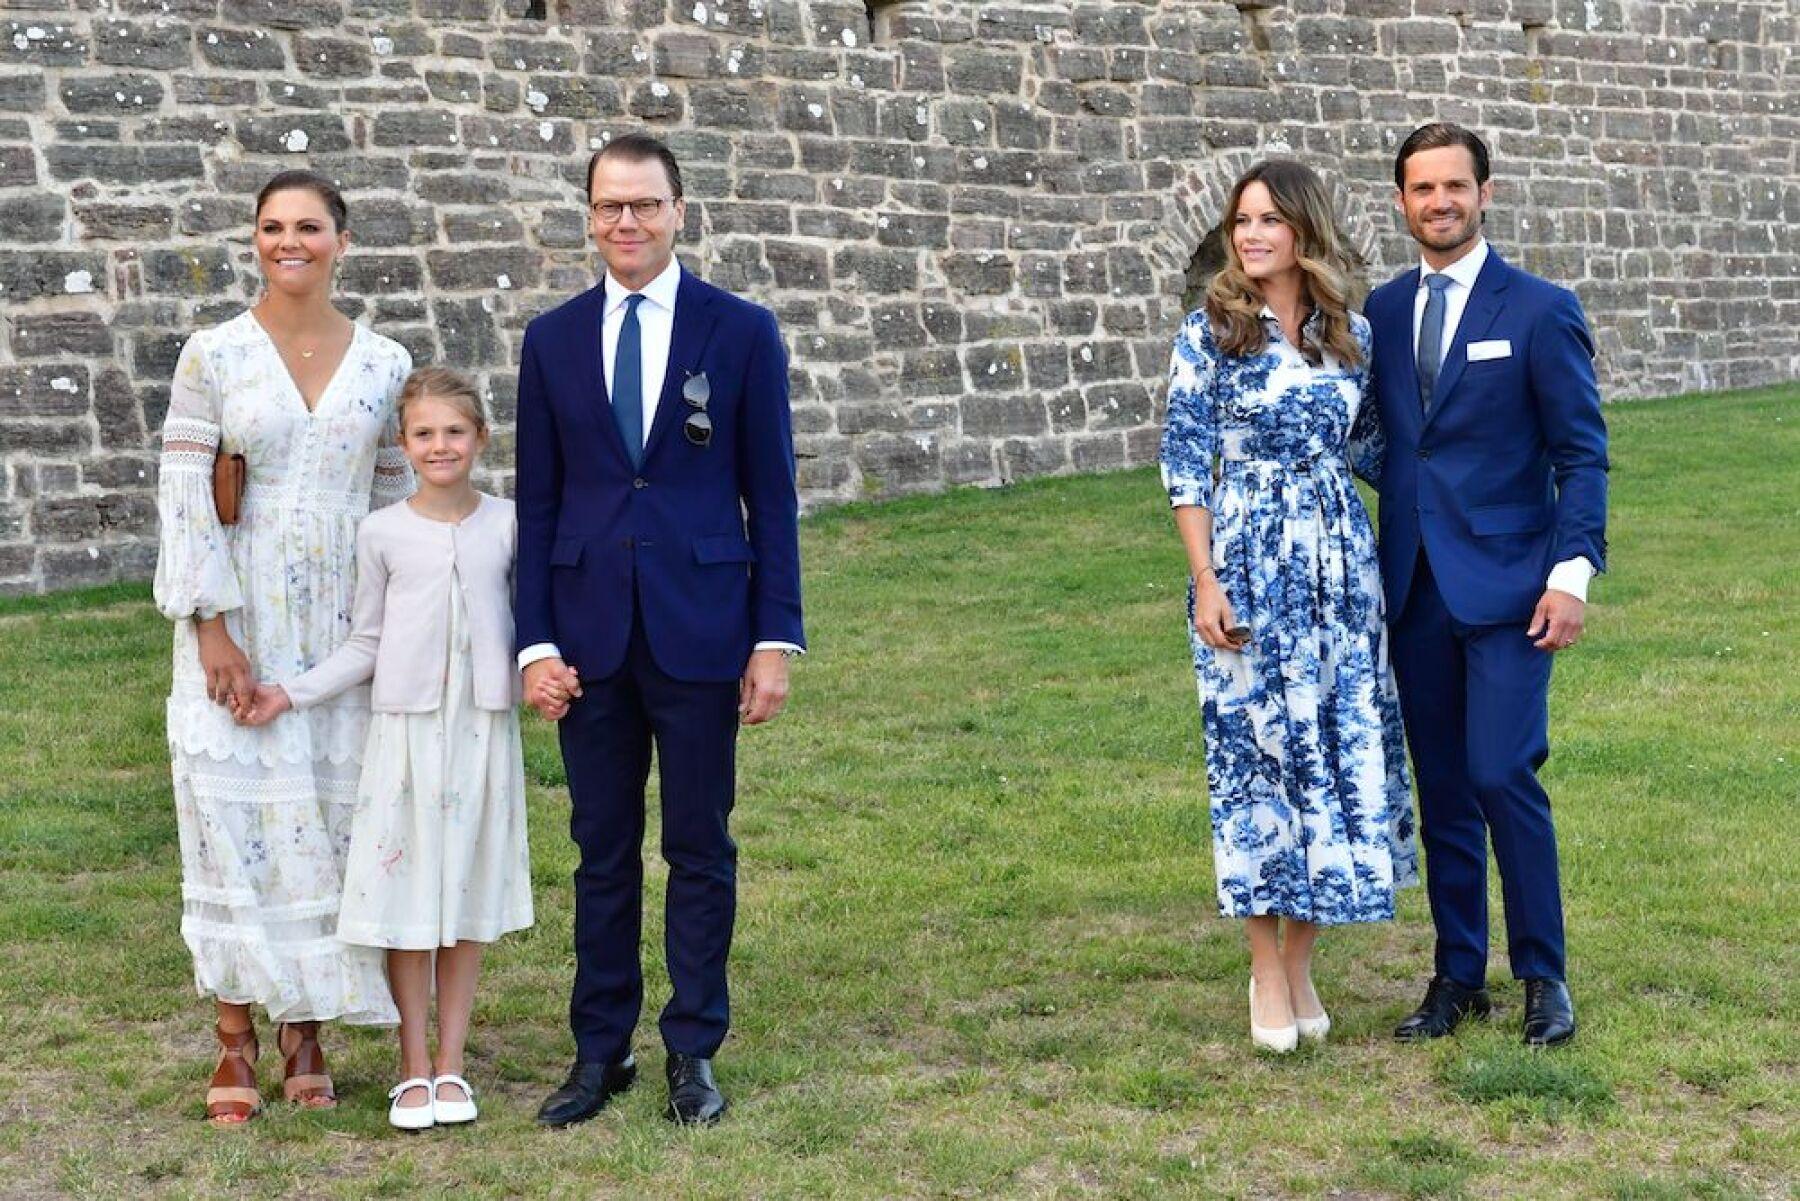 Crown Princess Victoria of Sweden birthday celebrations, Borgholm, Sweden - 14 Jul 2020